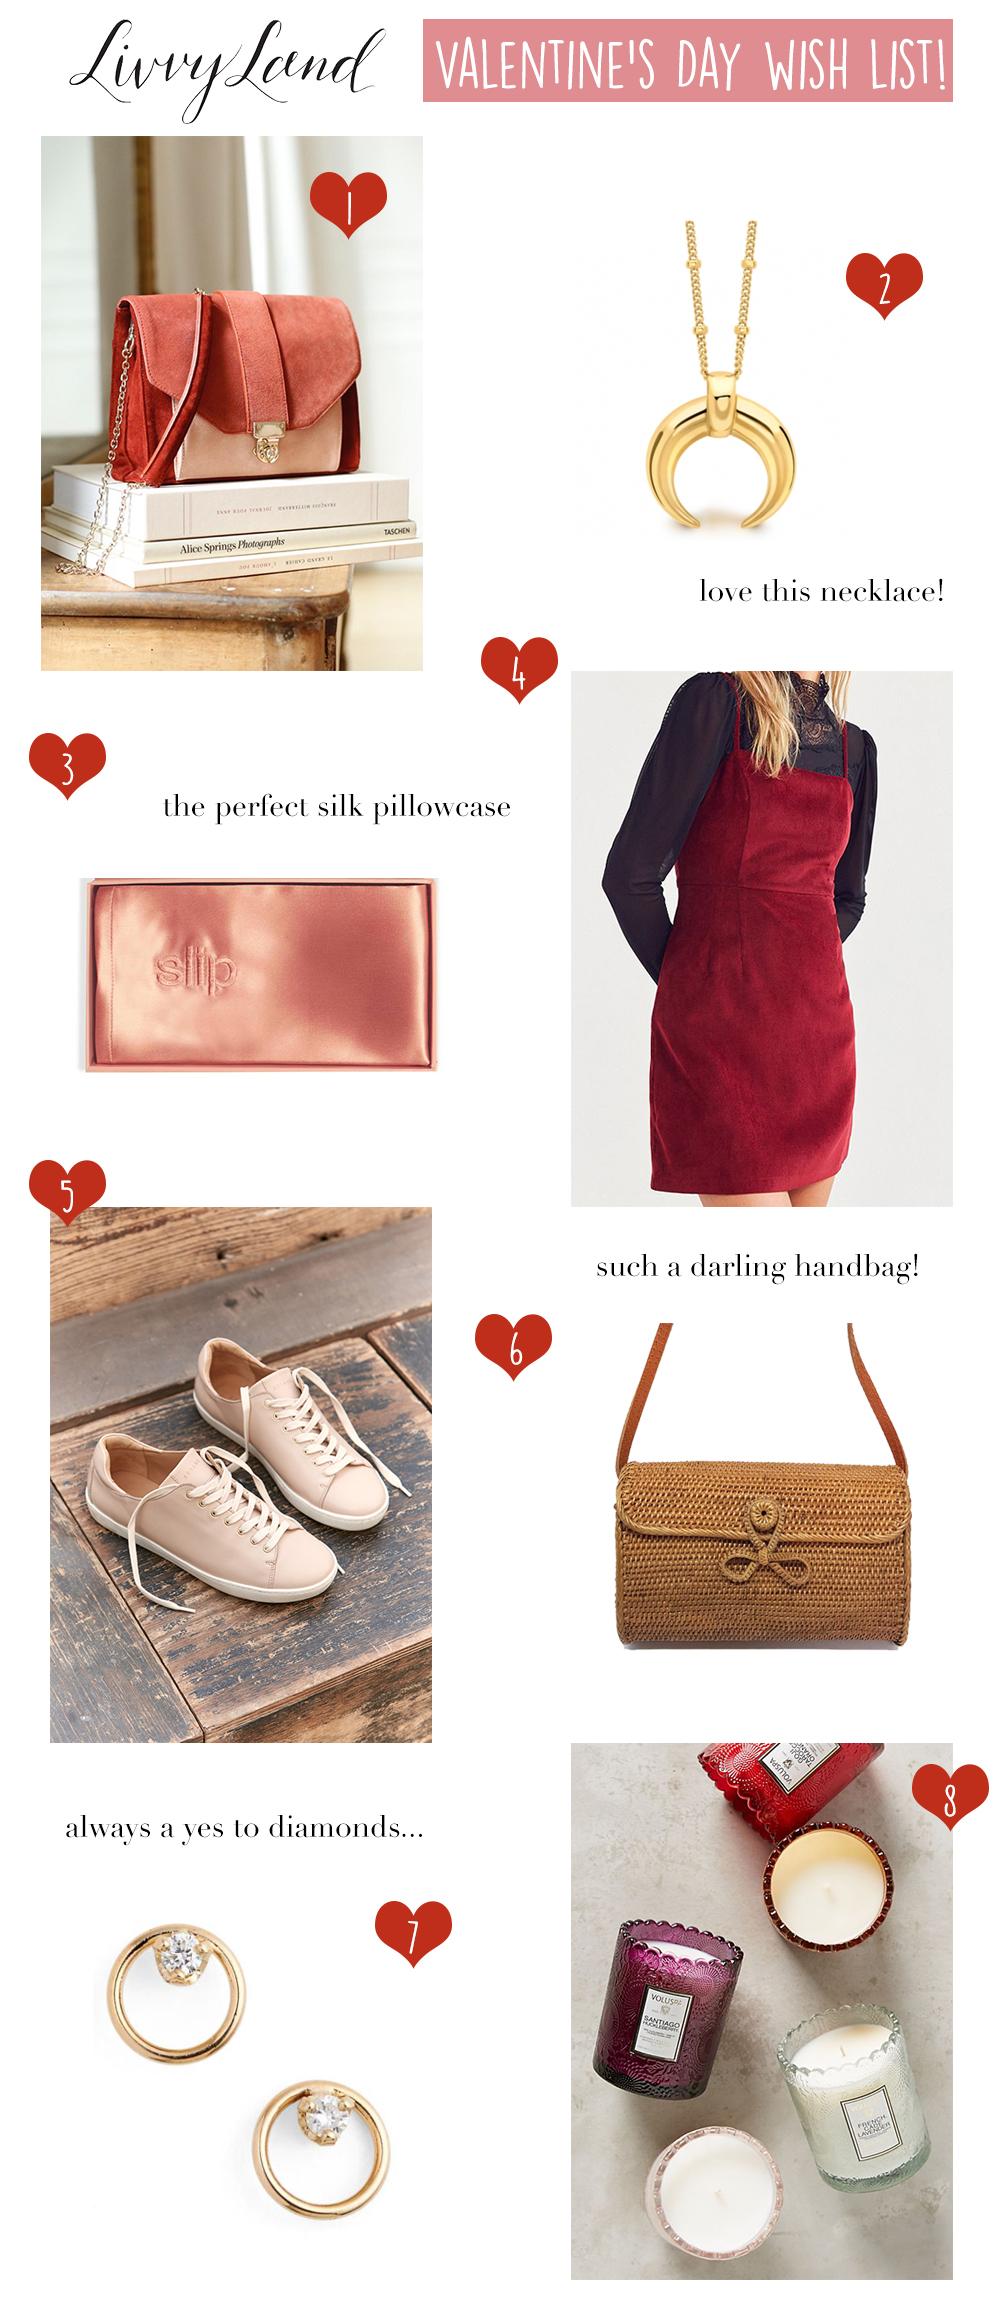 livvyland-valentines-day-gift-guide-girls-my-wish-list